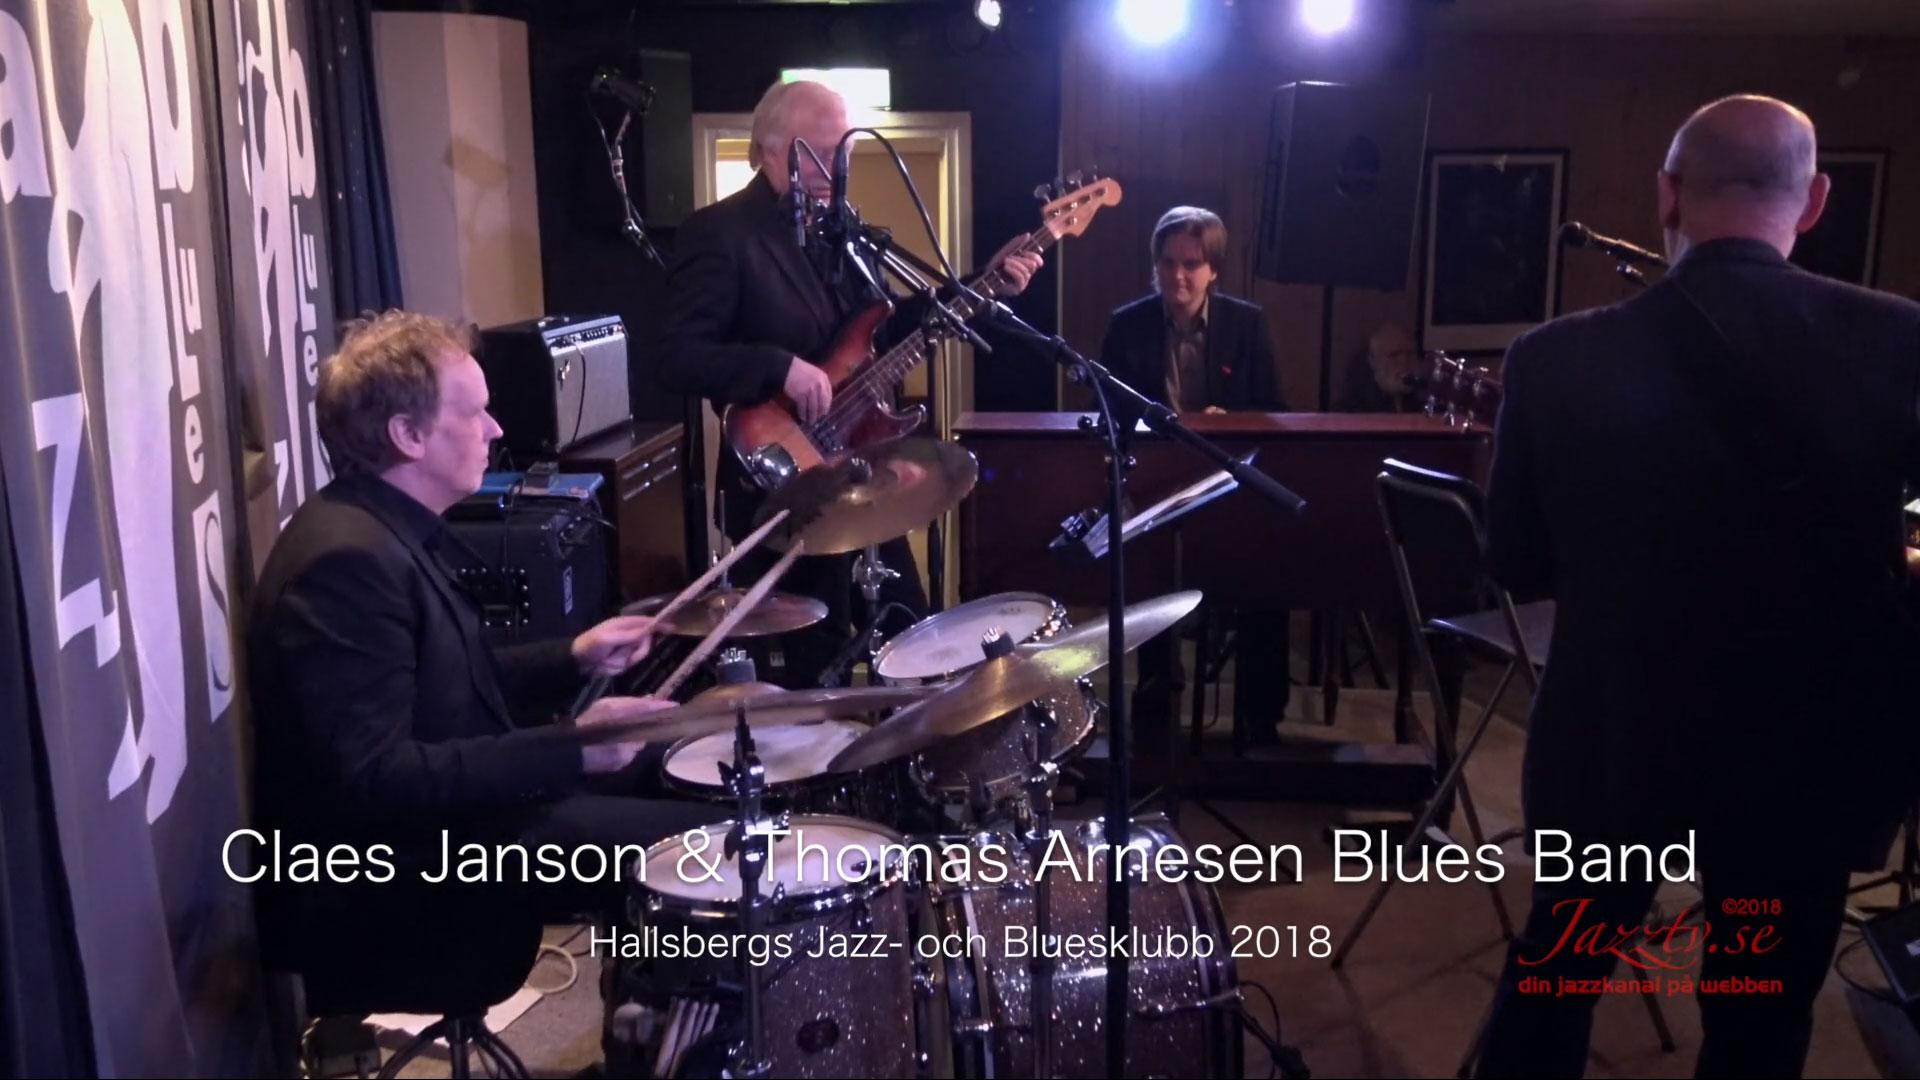 Claes Janson / Thomas Arnesen Blues Band